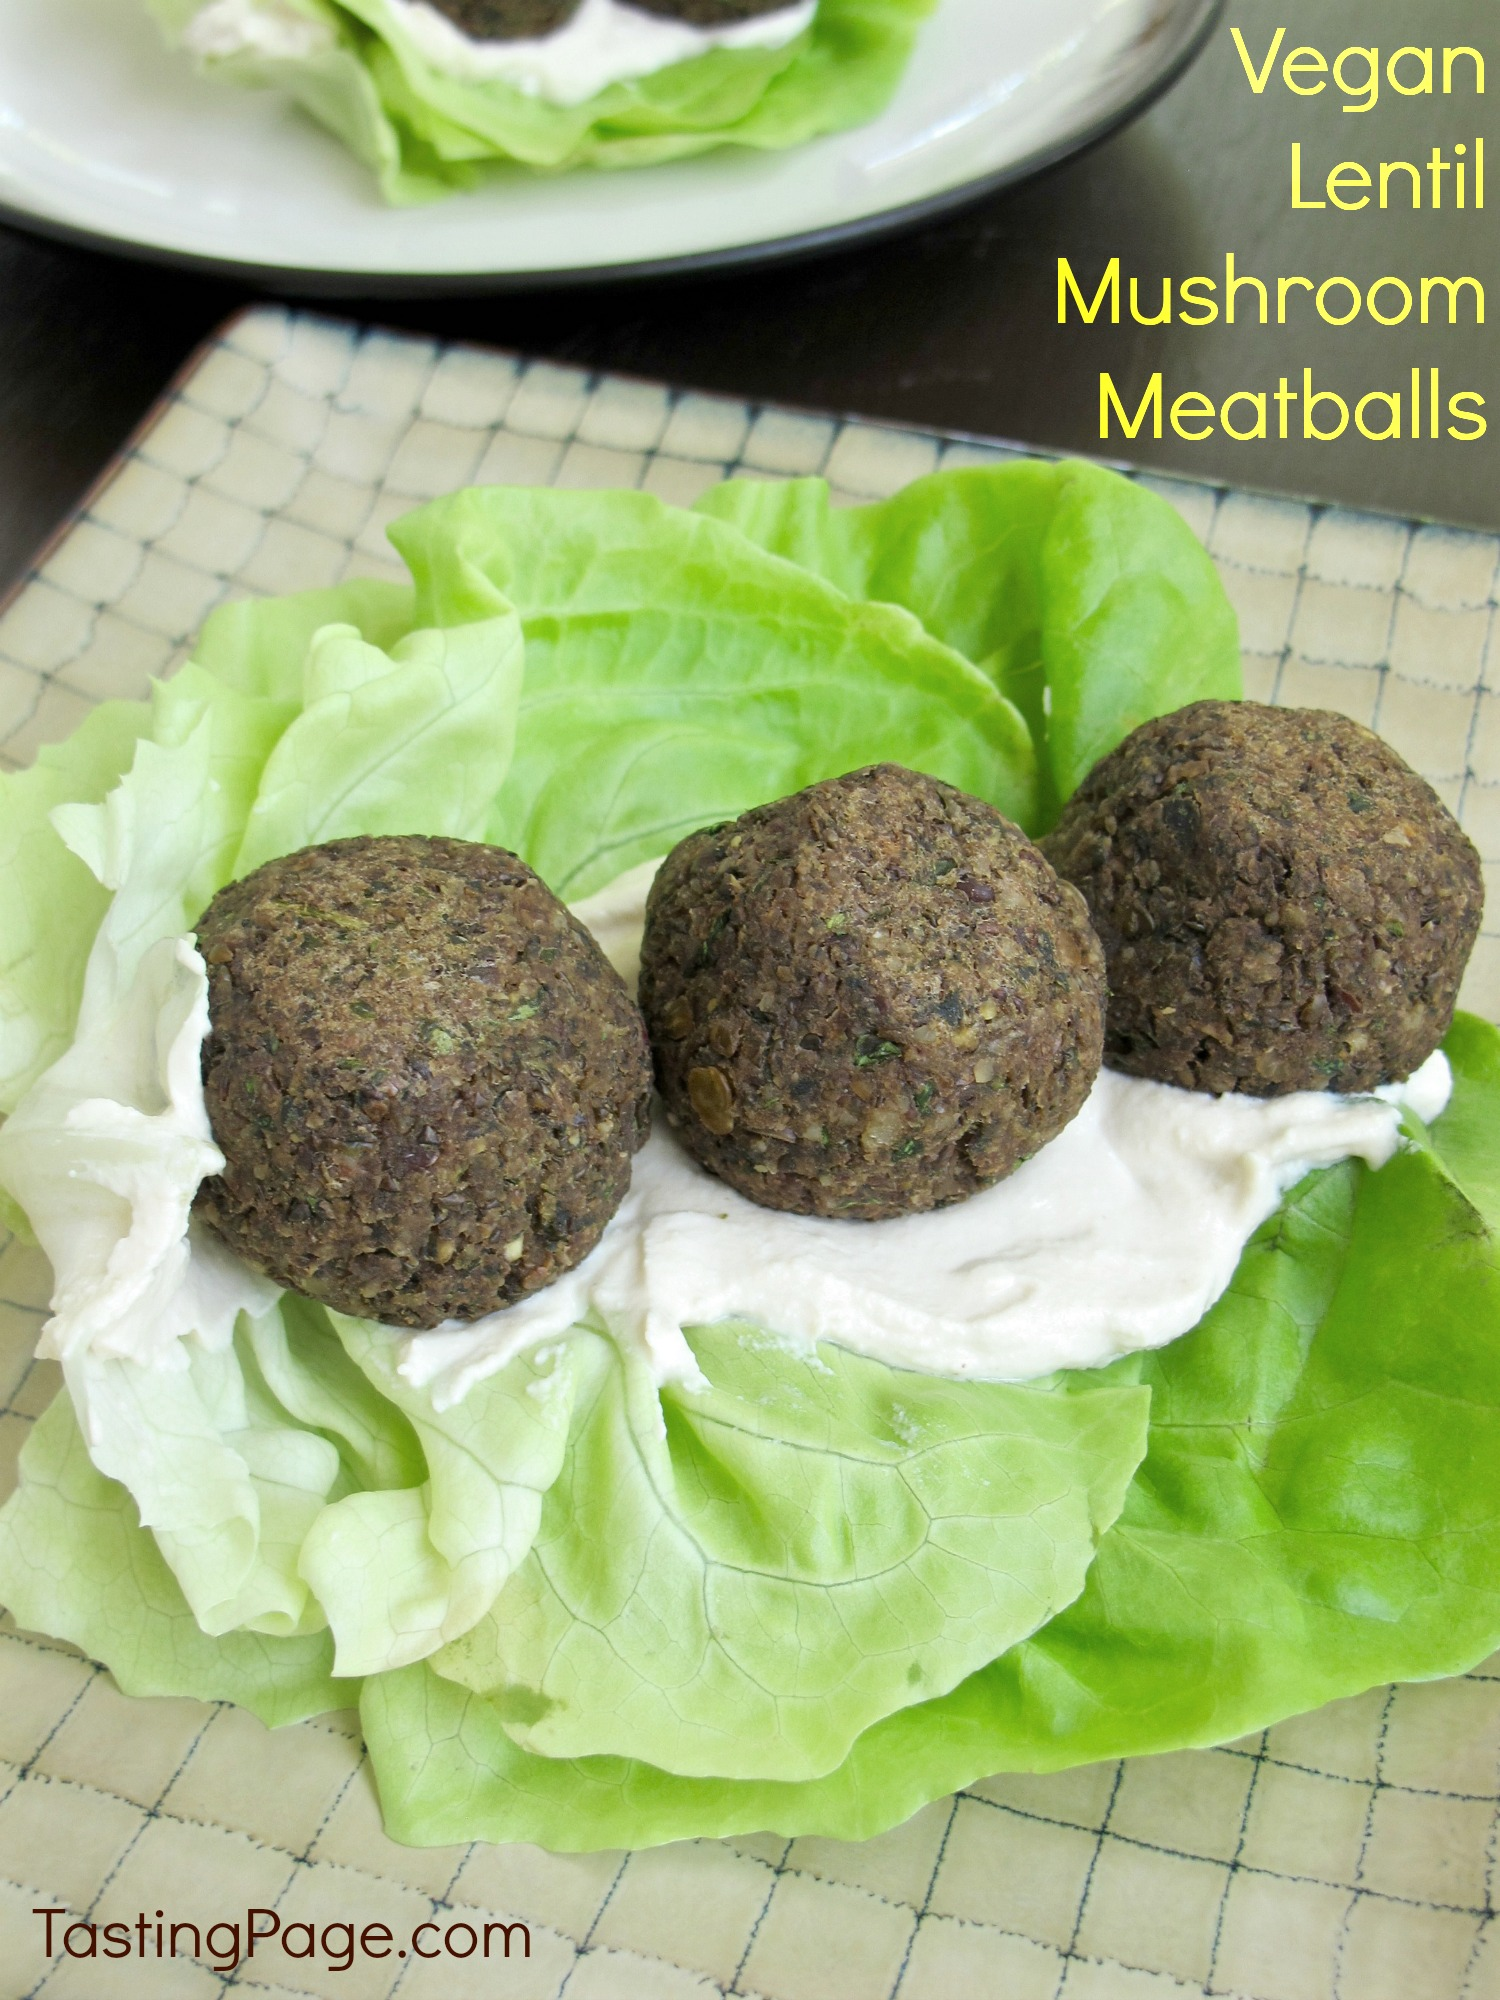 Vegan Lentil Mushroom Meatballs - a tasty meat-less meal filled with veggies - Tasting Page